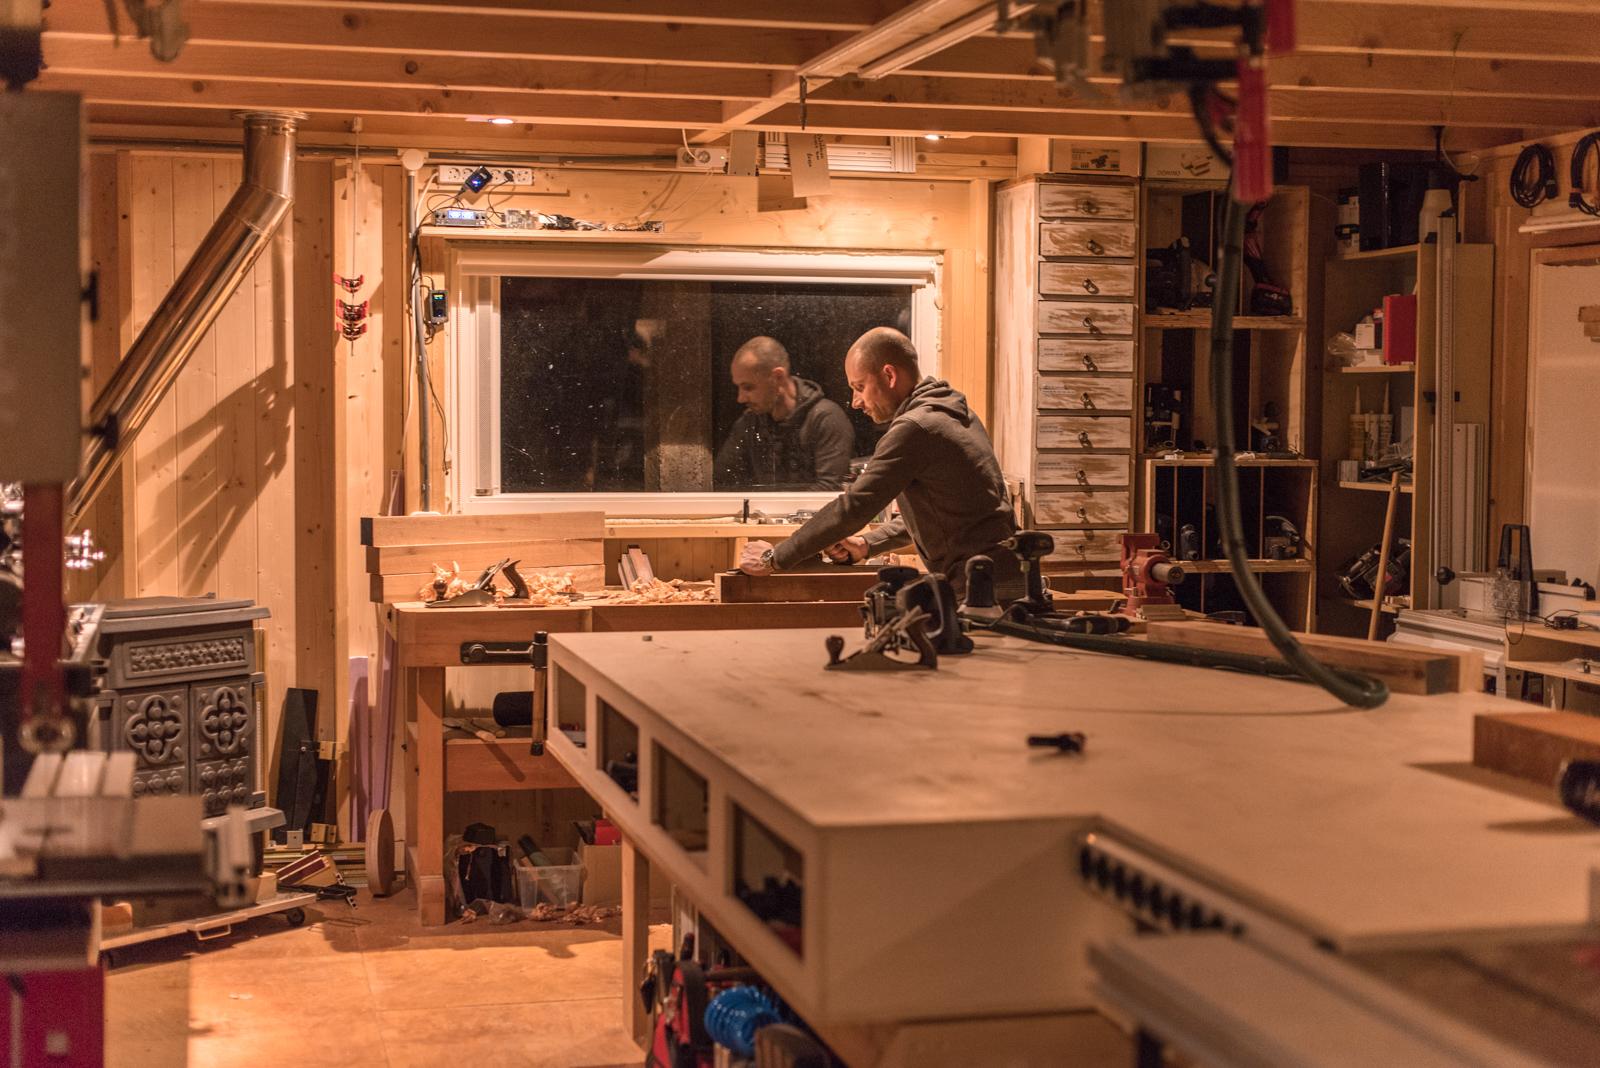 Werkplek houtbewerker Tweakhout door Josita Swarte Photography-60